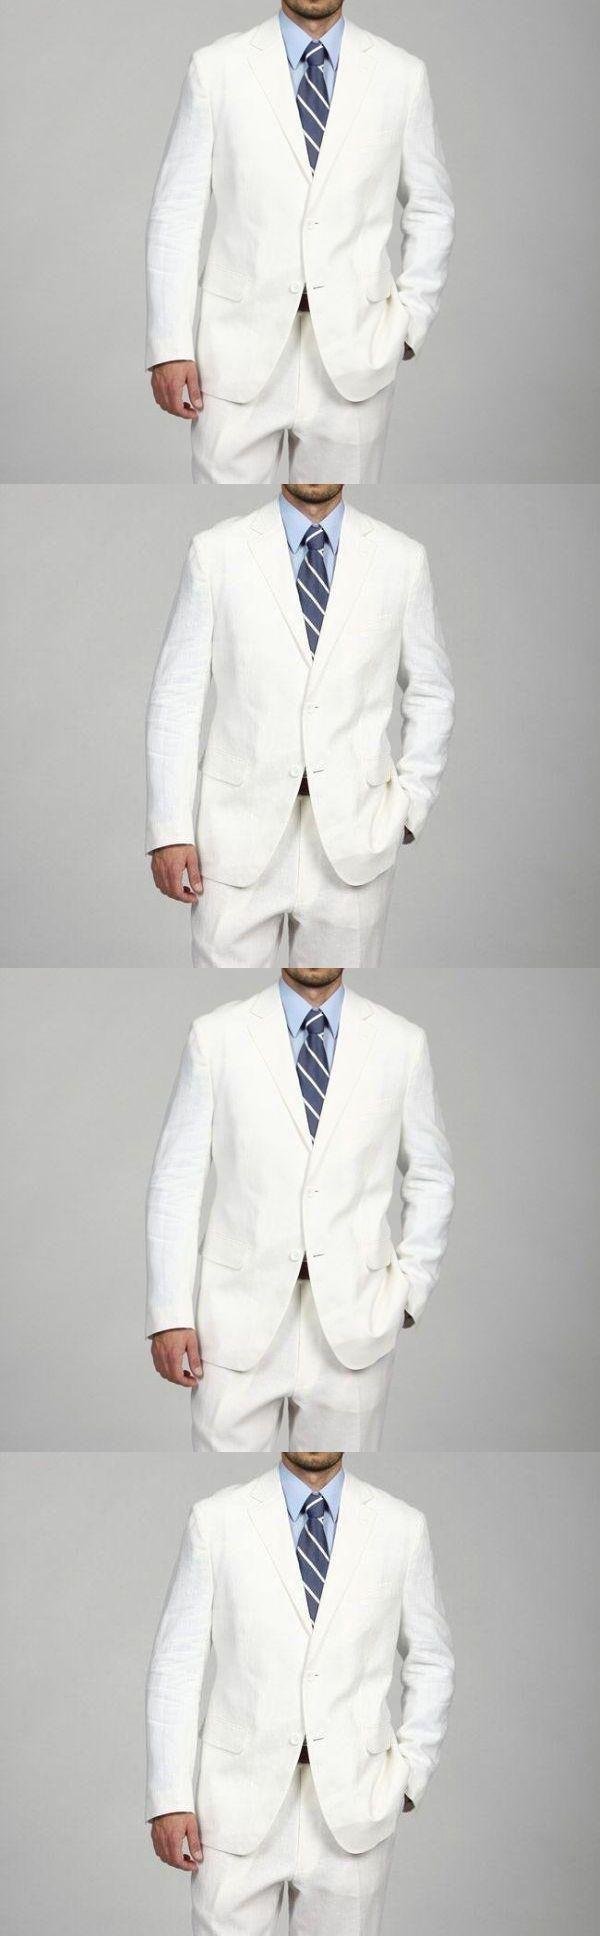 2016 New Arrival Custom Mens Suits White Wedding Suits For Men Notched Lapel Slim Fit Grooms Tuxedos 2 Pieces Business Men Suit